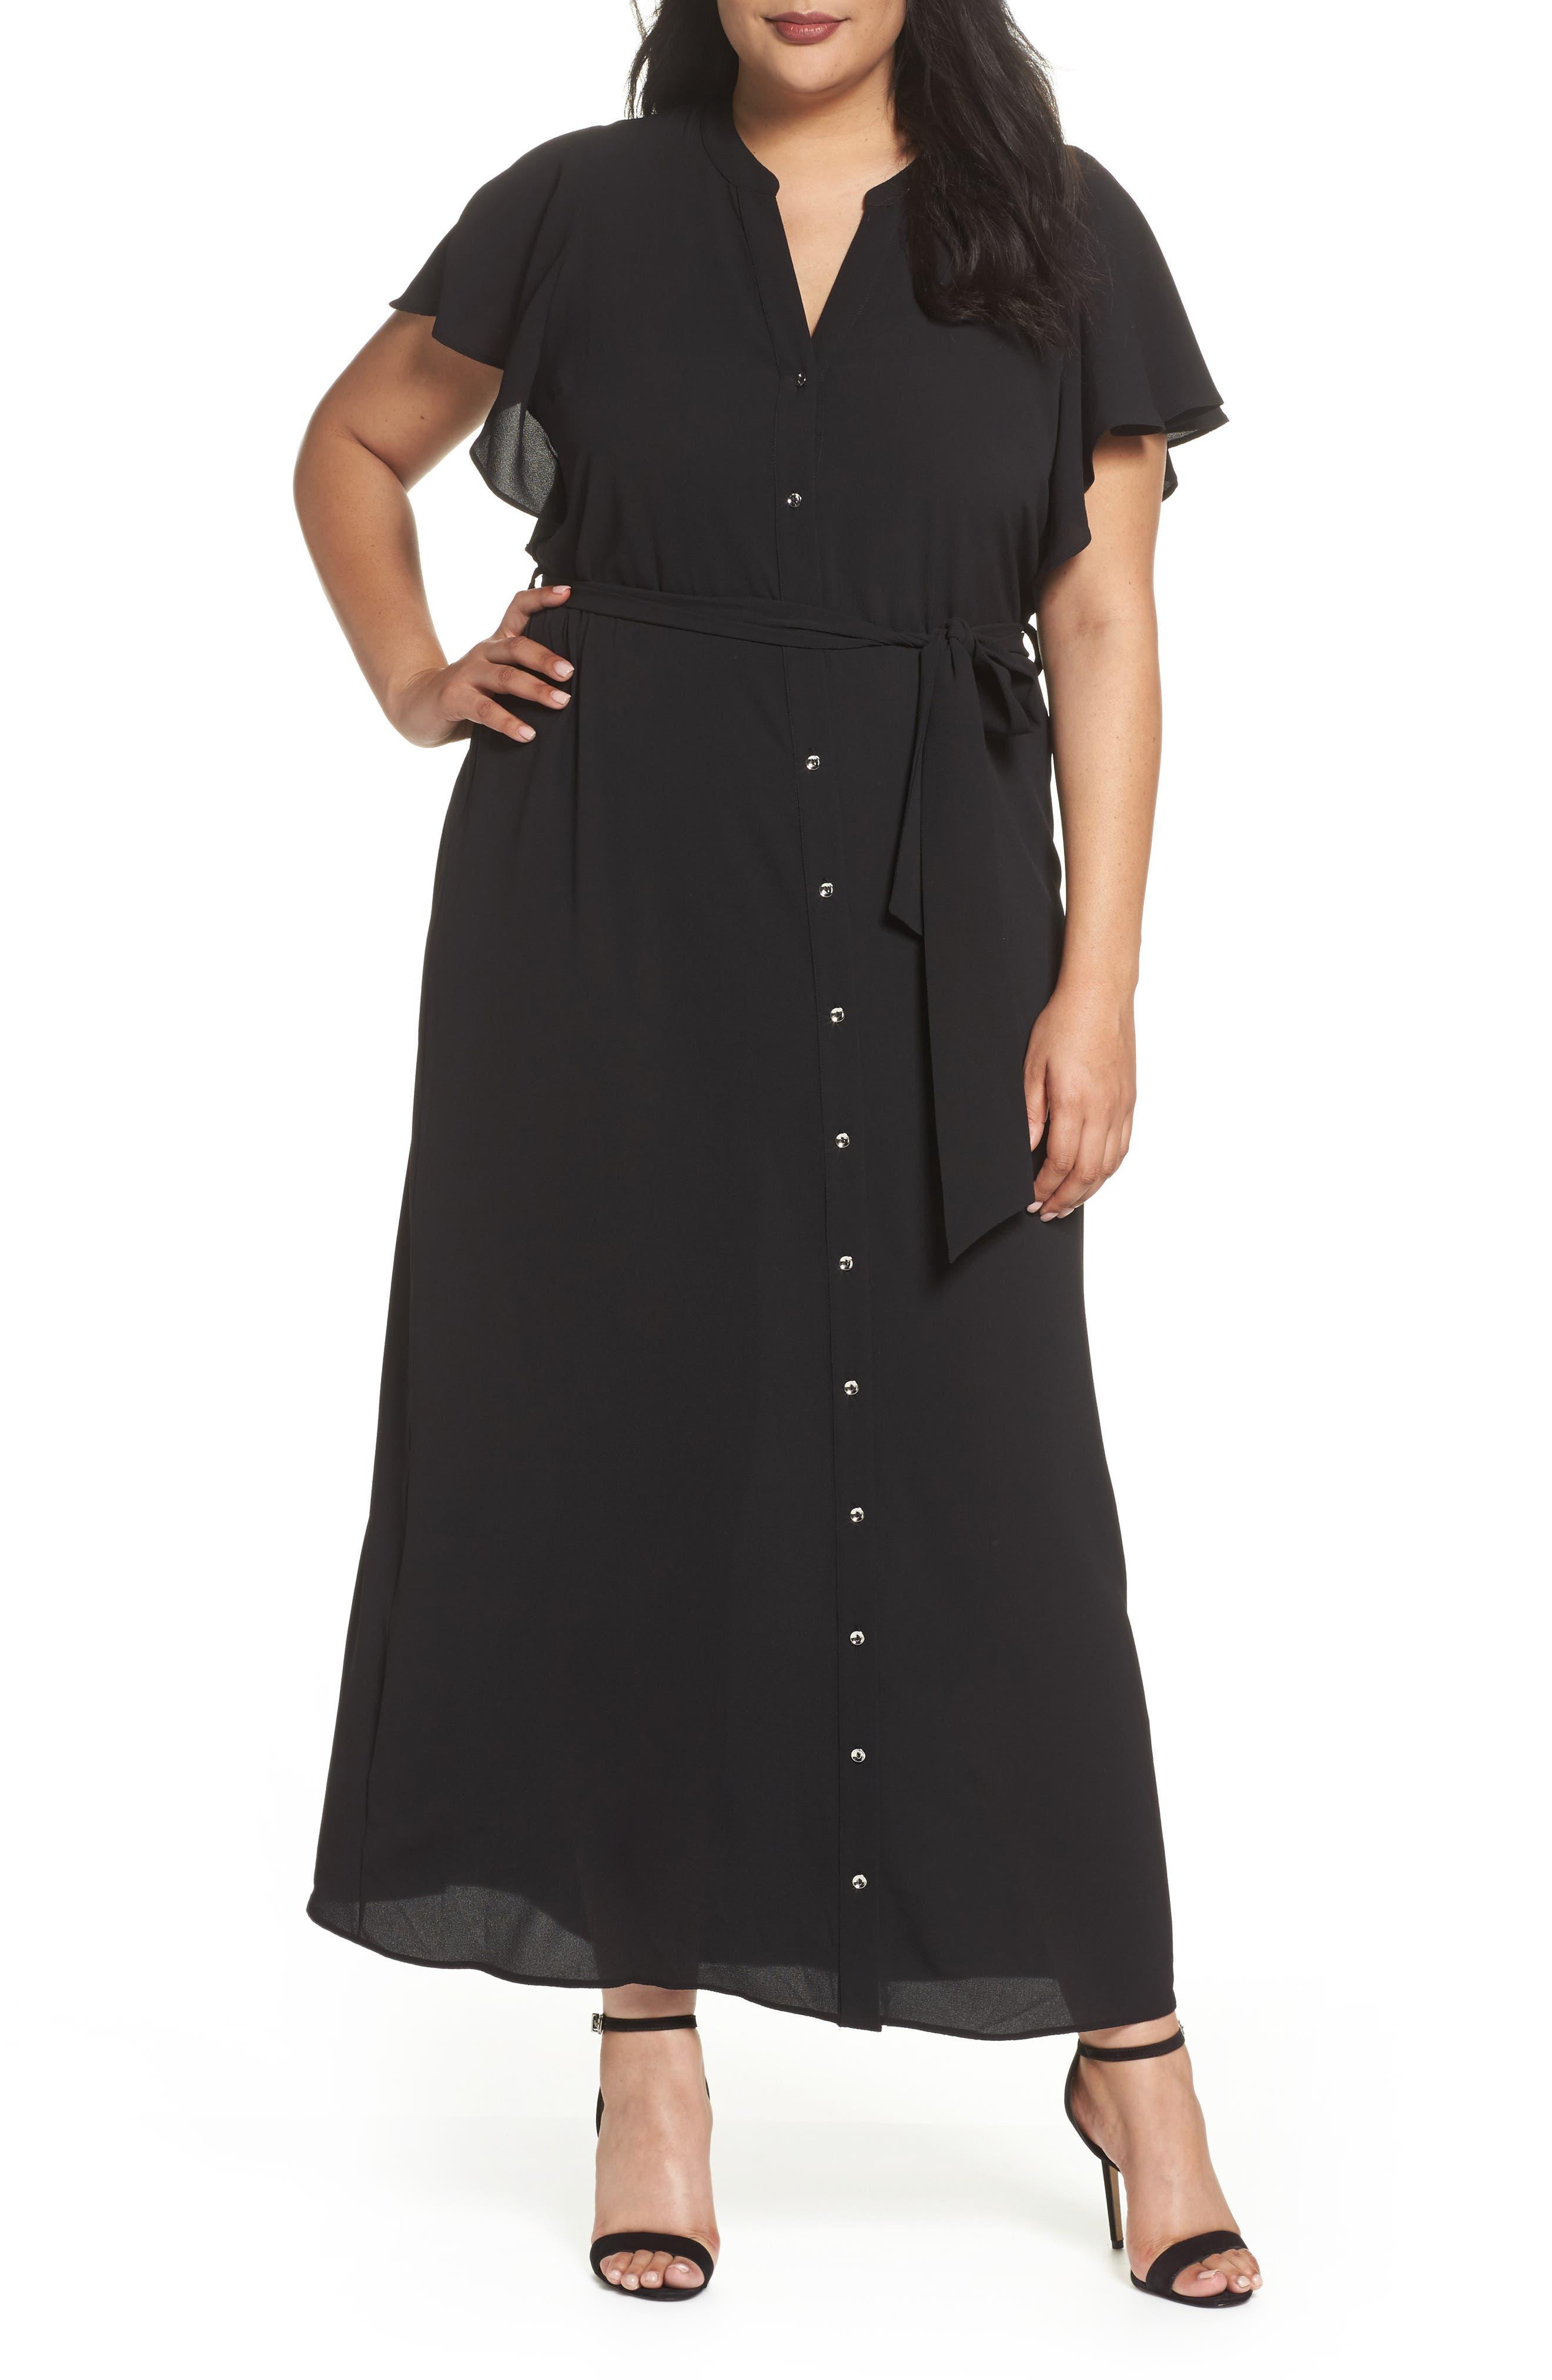 Alternate Image 1 Selected - Evans Ruffled Maxi Shirtdress (Plus Size)